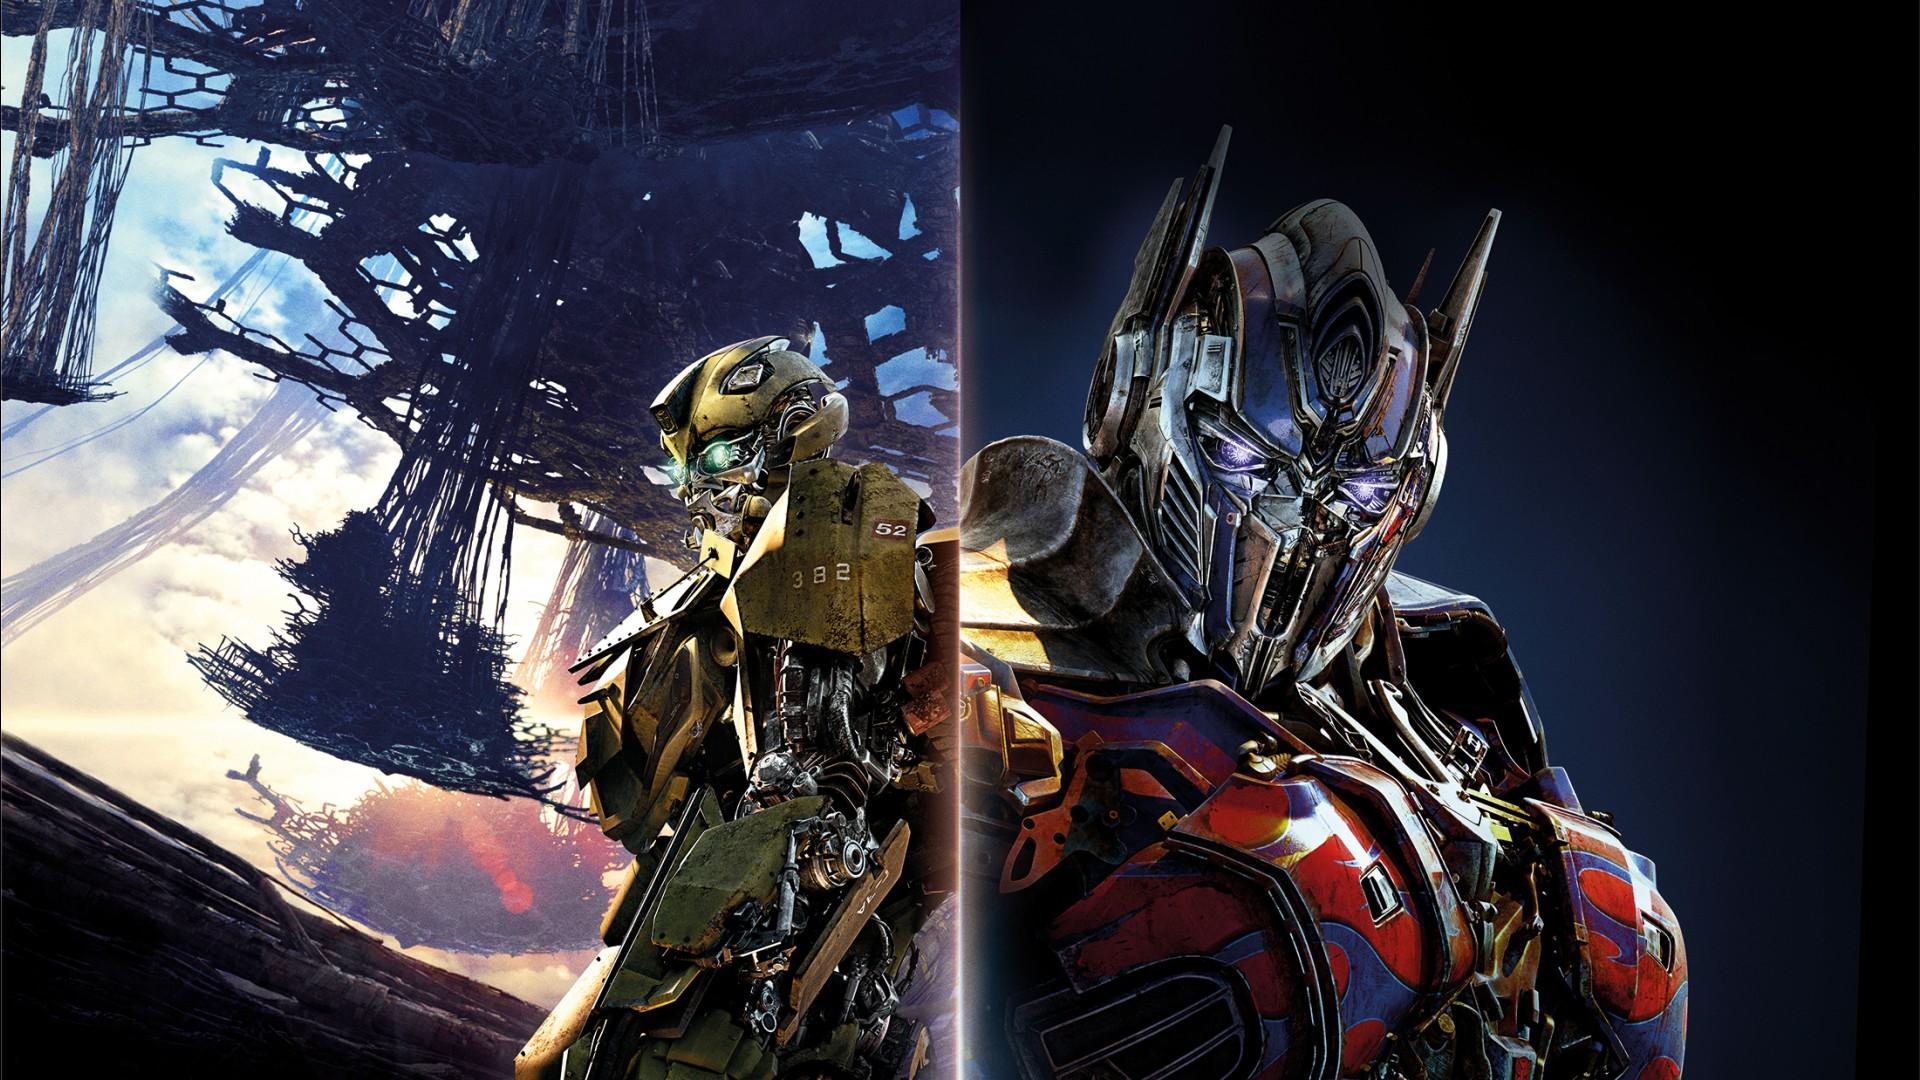 Wallpaper Hd Star Wars Bumblebee Optimus Prime Transformers The Last Knight